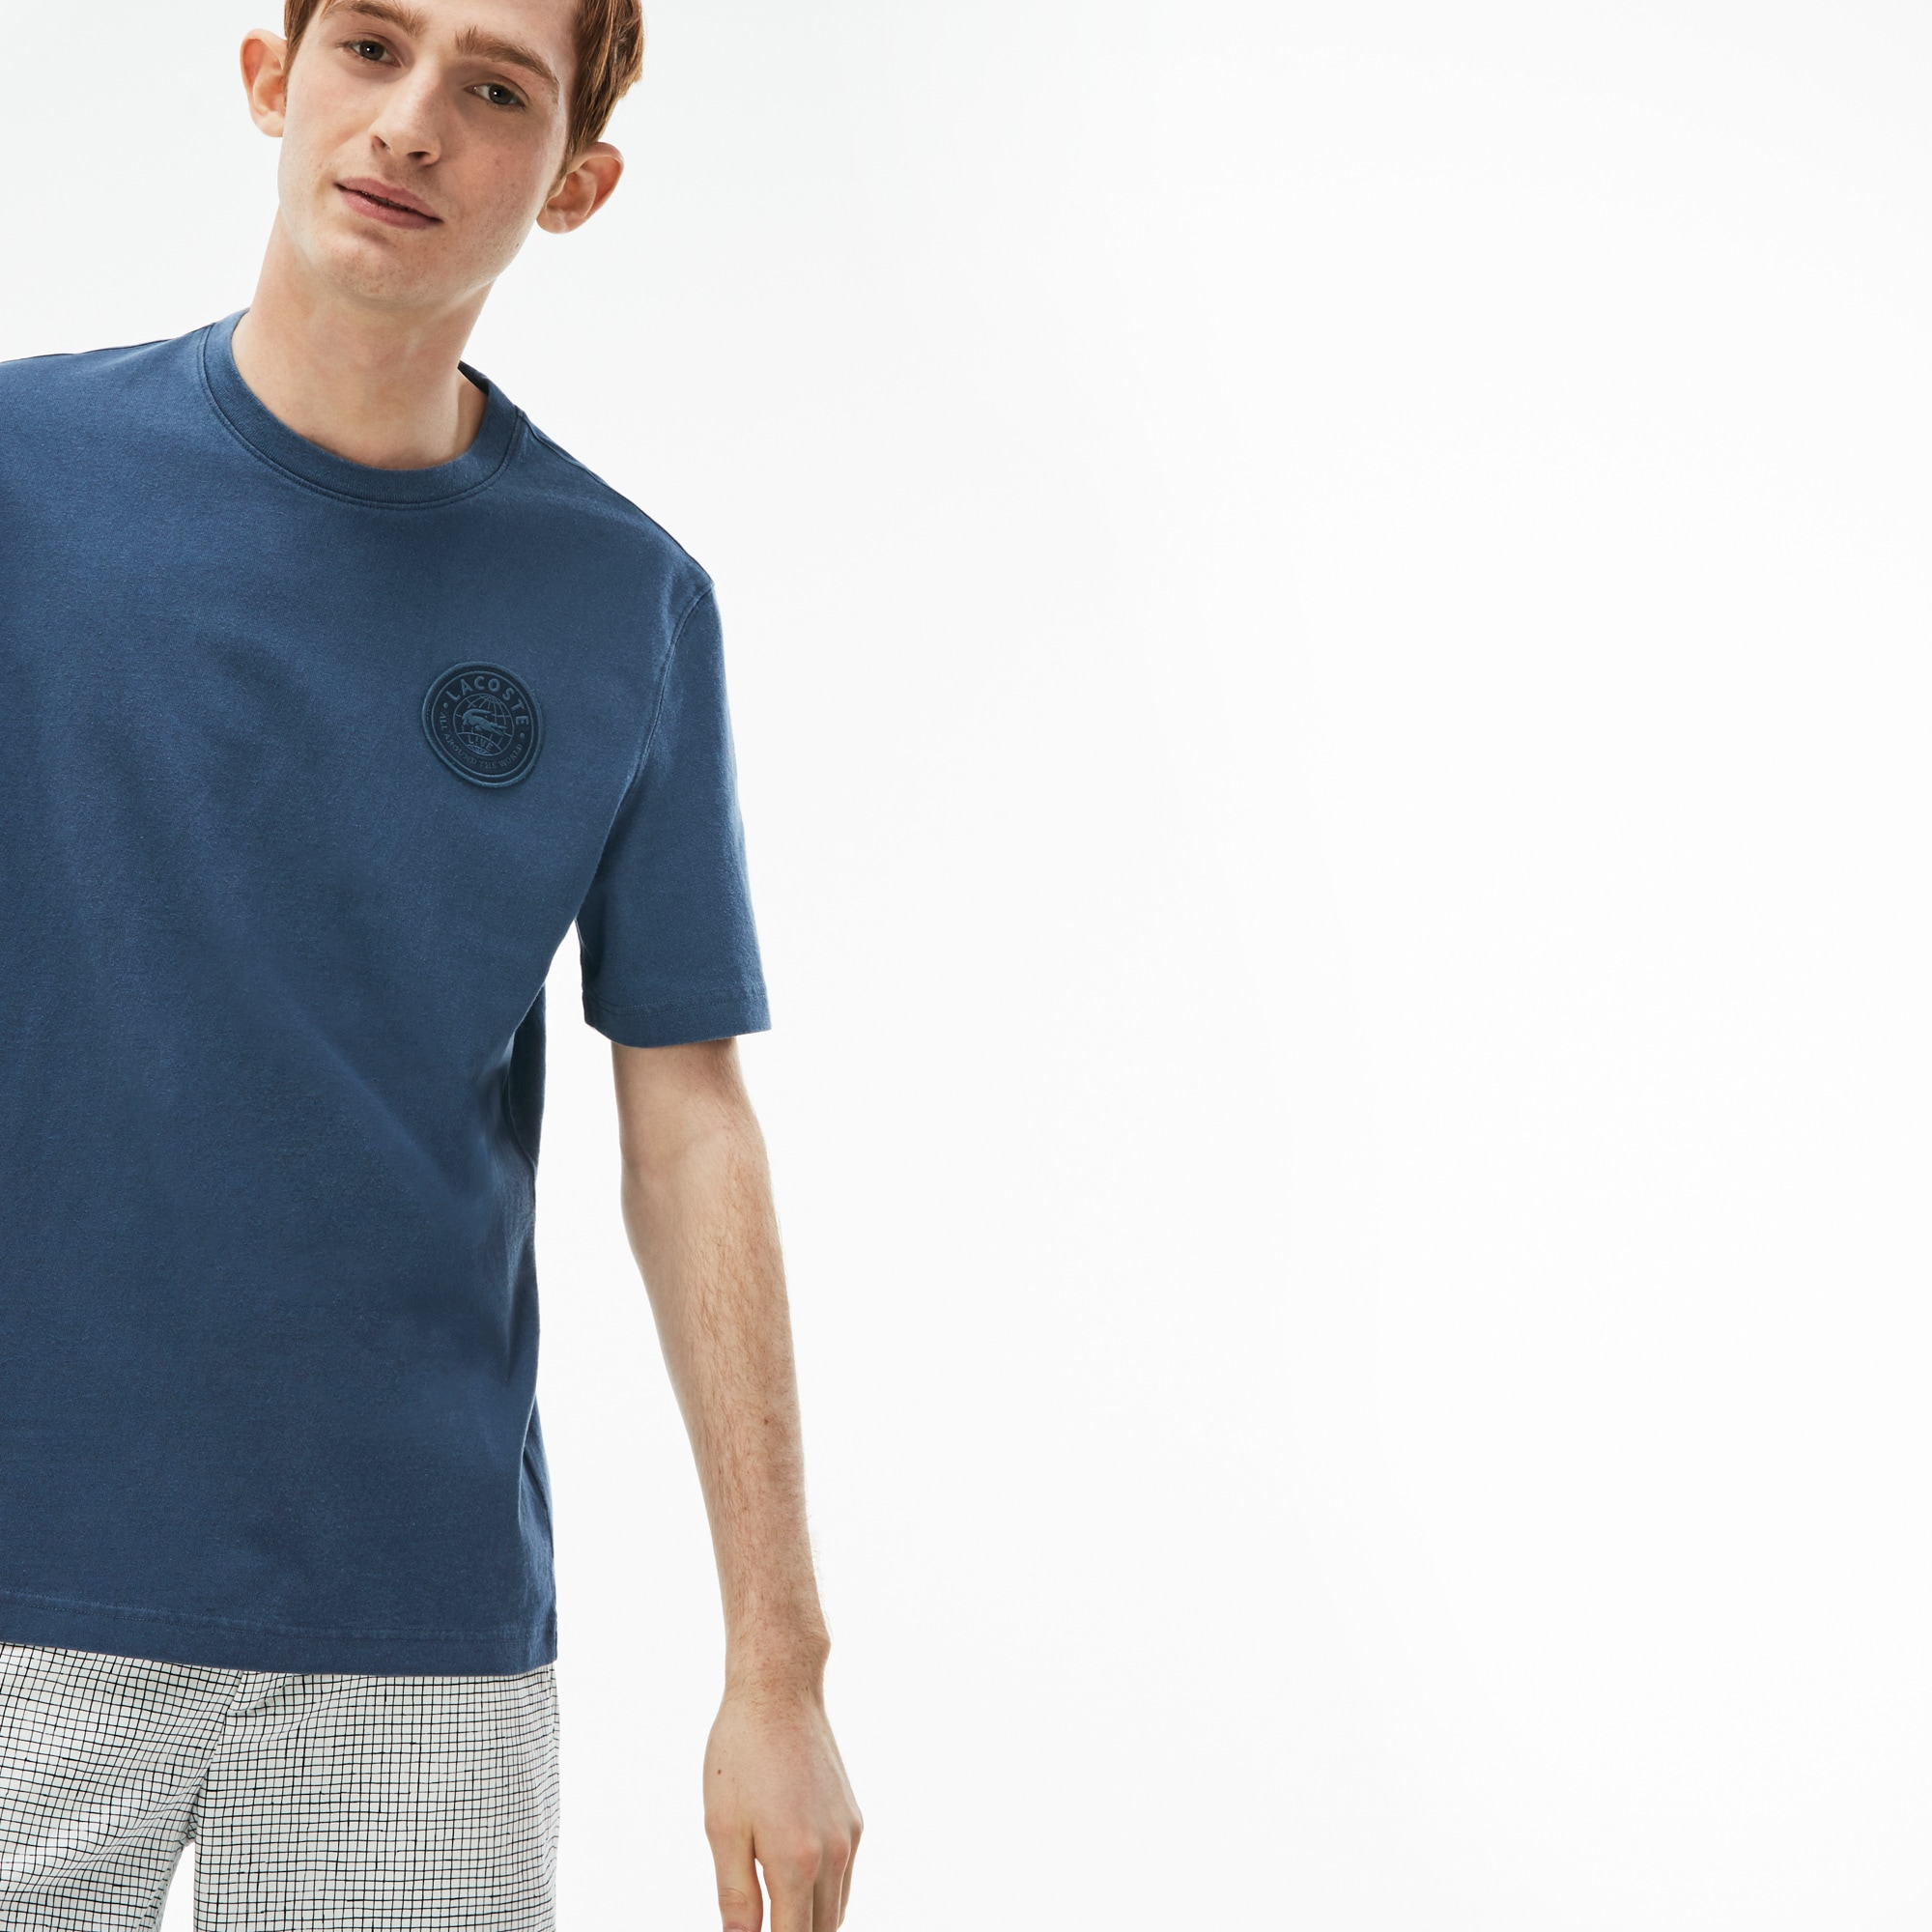 T-shirt a girocollo Lacoste LIVE in jersey délavé con badge